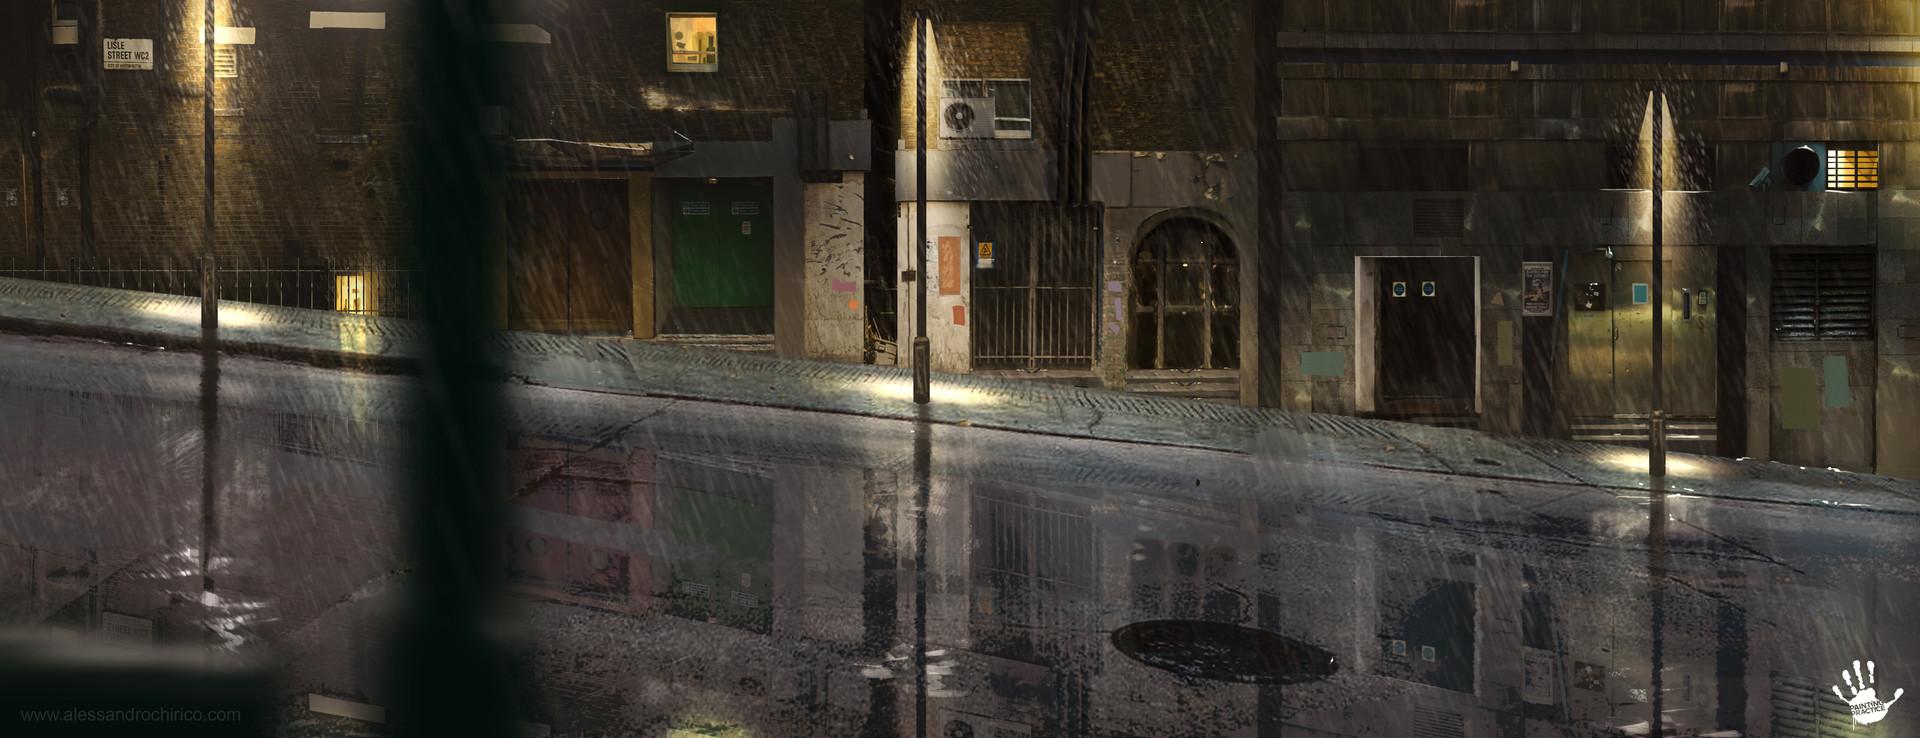 Alessandro chirico 10 concept street